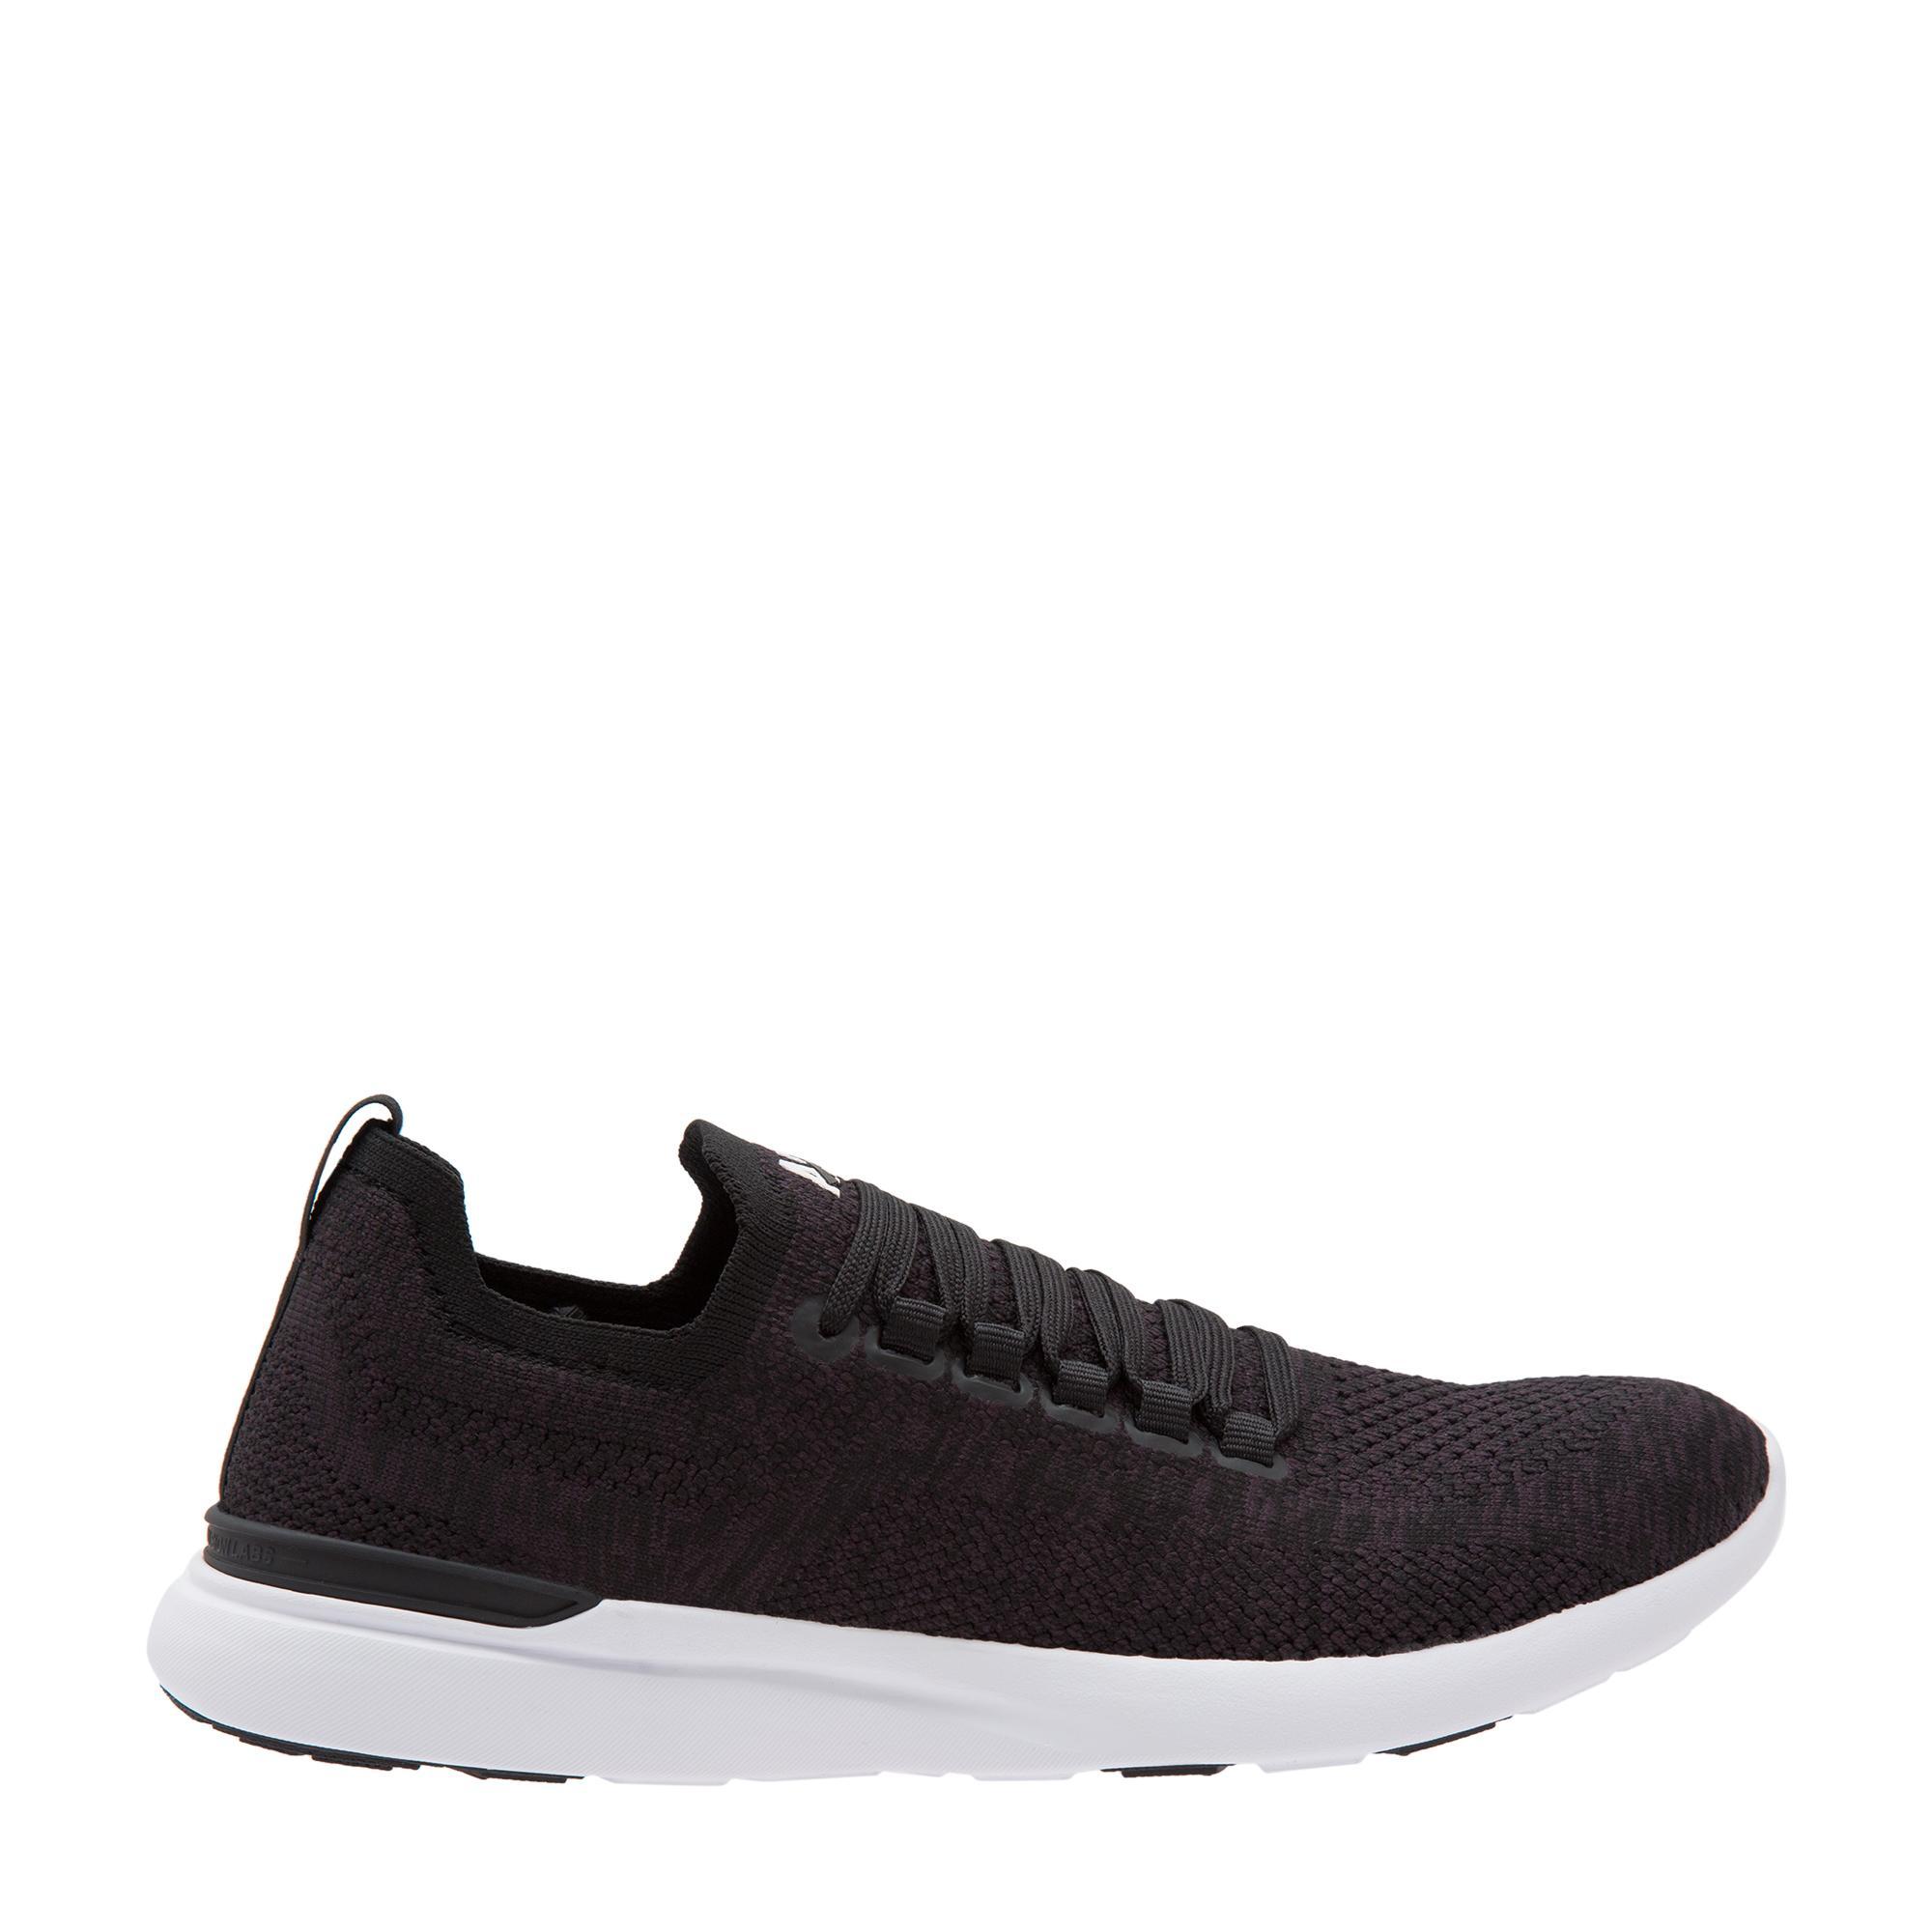 TechLoom Breeze sneakers